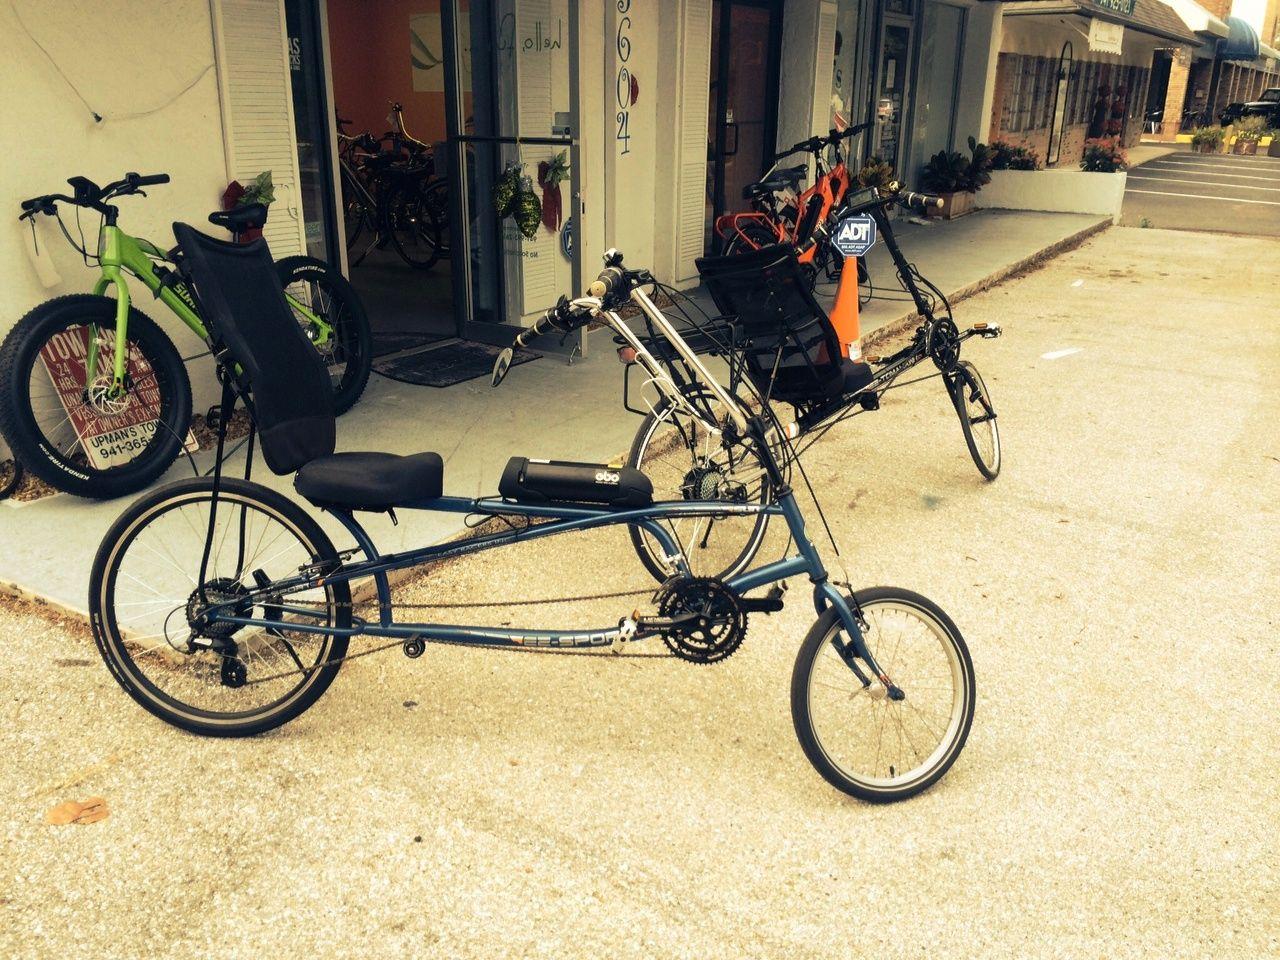 Electric Bike Outfitters Phantom E Bike Conversion Kits Installed On A Sun Tomahawk Cx Recumbent Bike Electric Bike Electric Bike Kits Bike